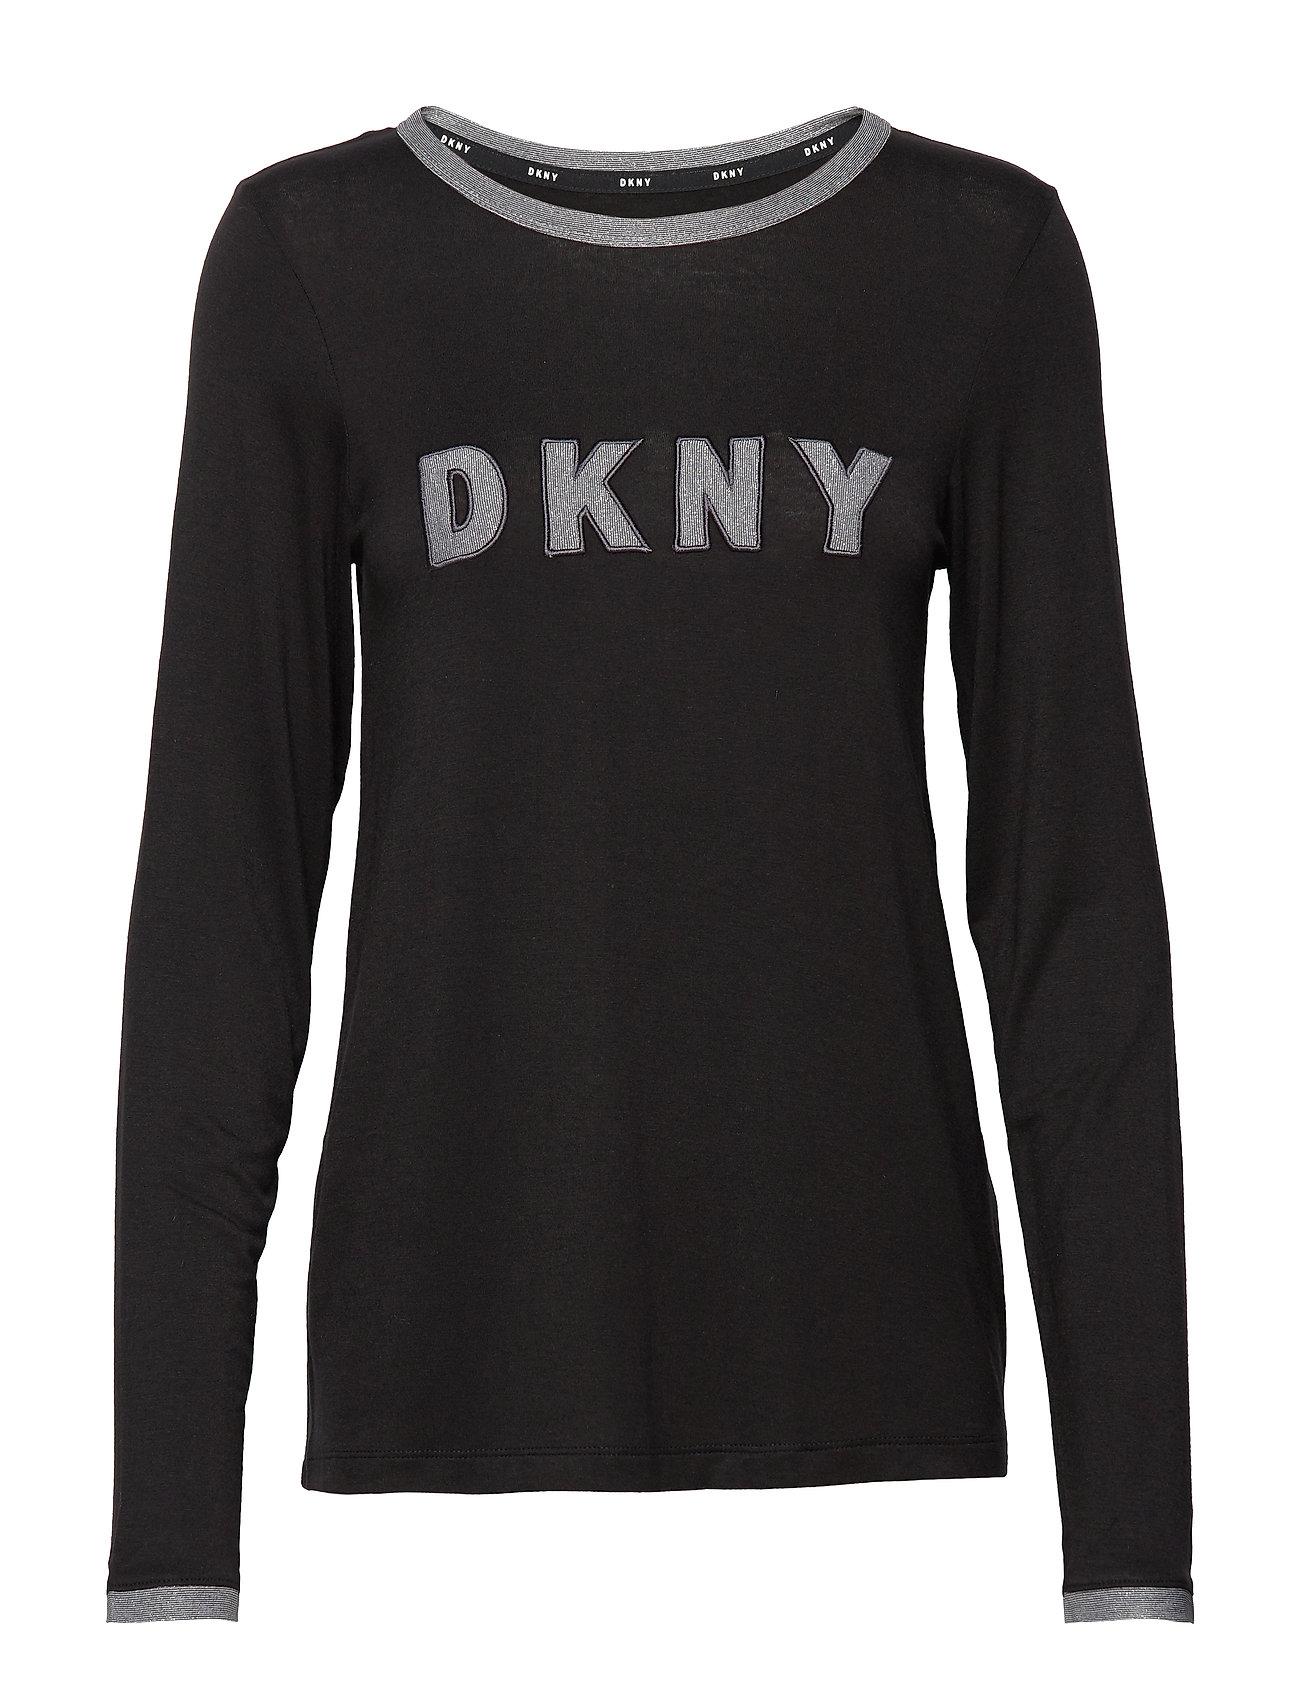 DKNY Homewear DKNY MIXED THREADS TOP L/S - BLACK